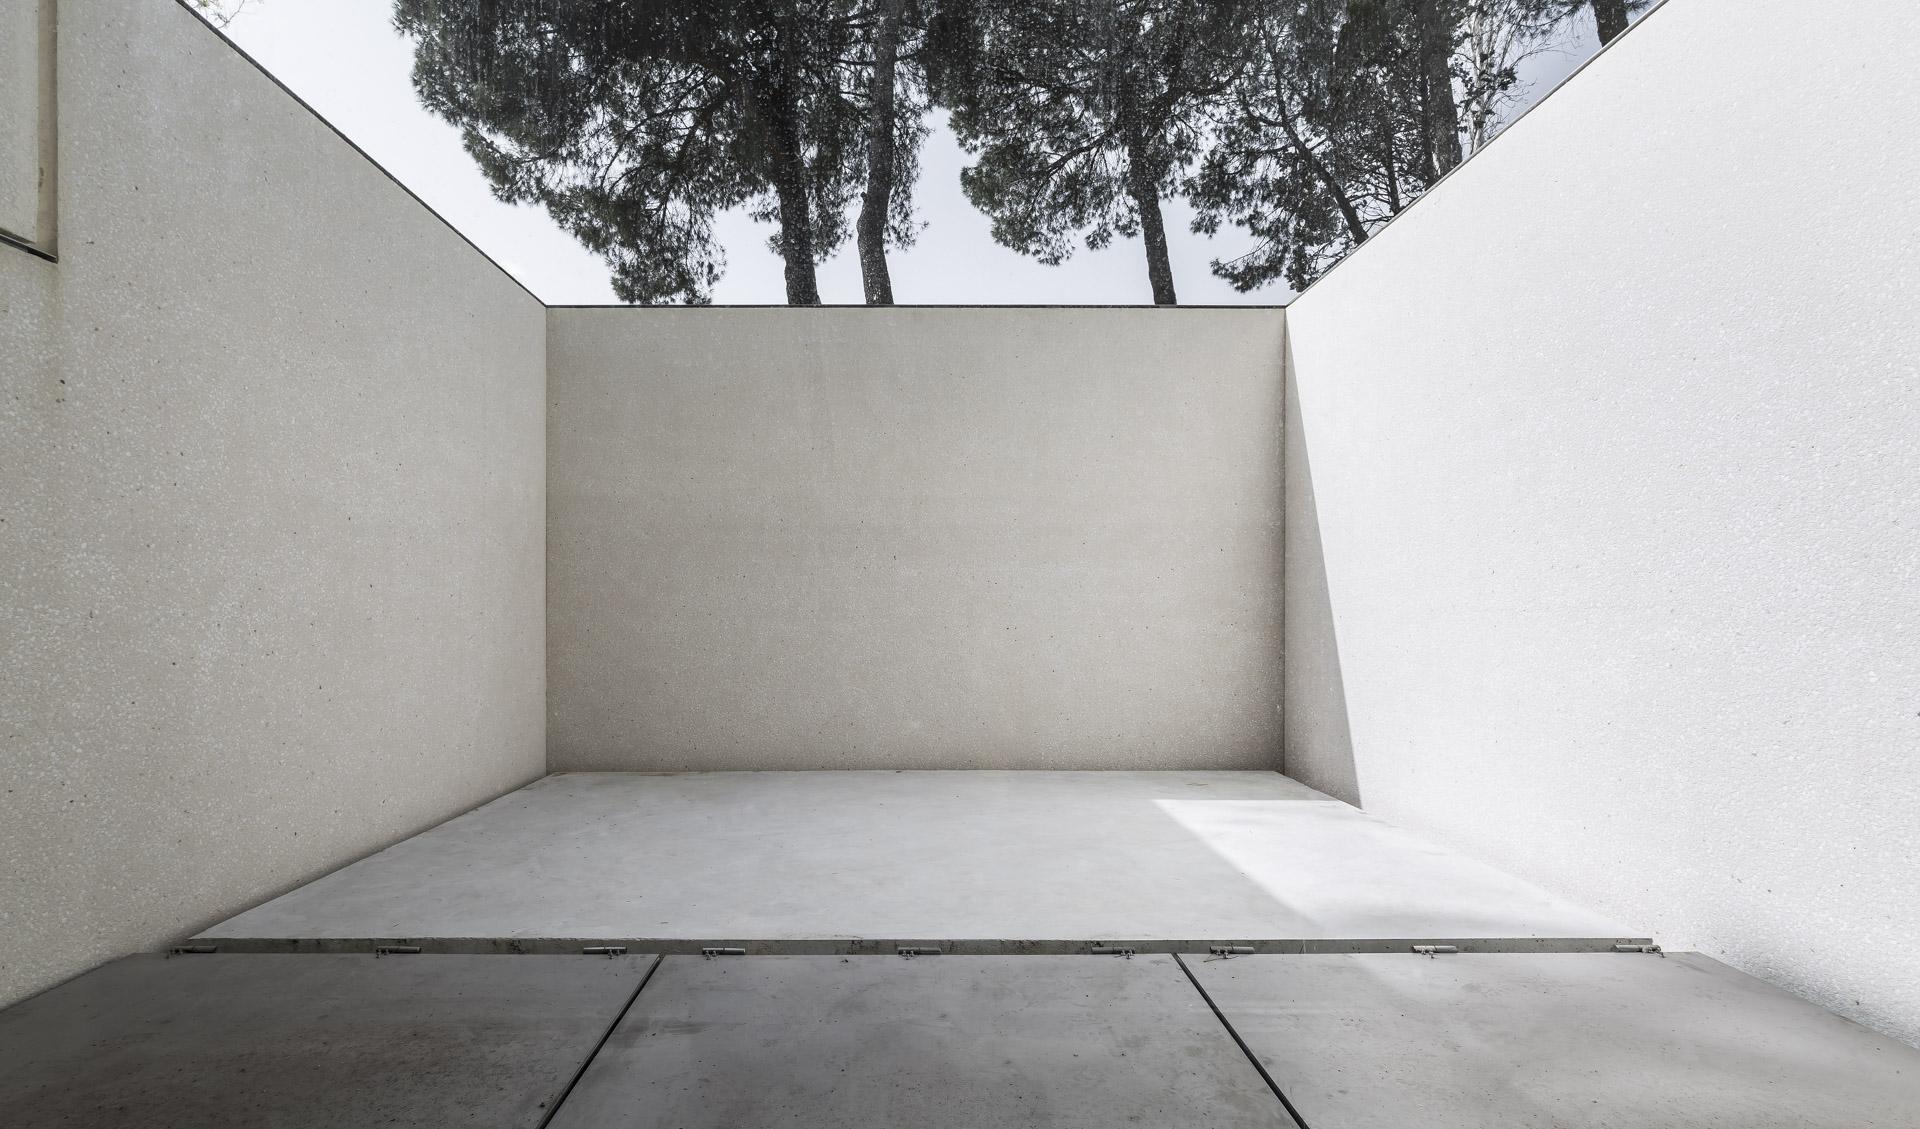 fotografia-arquitectura-madrid-nuevos-ministerios-elorza-german-cabo-11